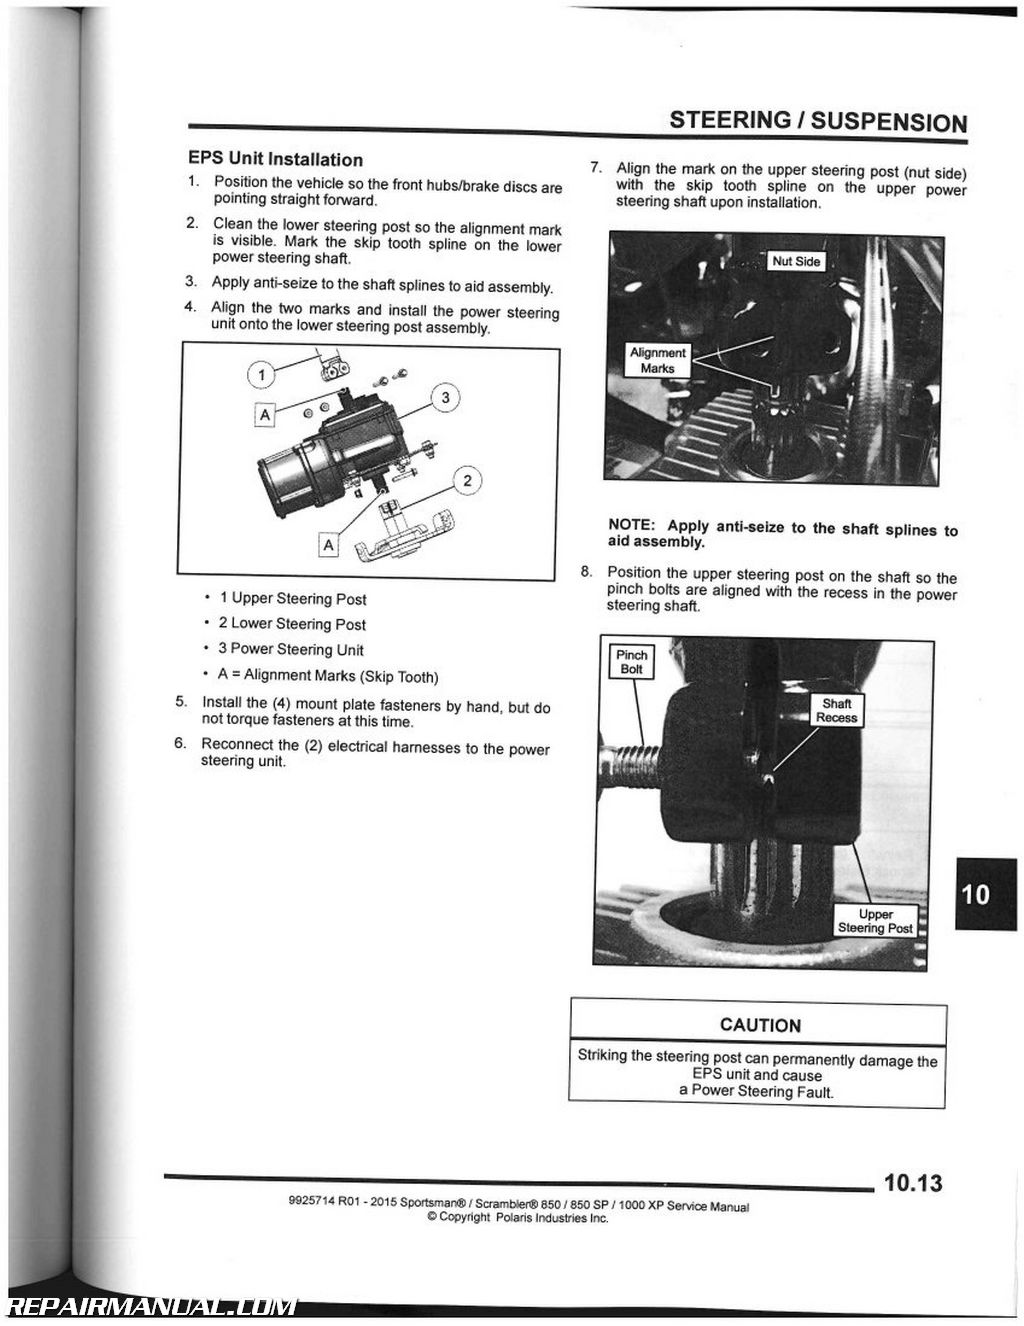 Polaris sportsman 850 service manual